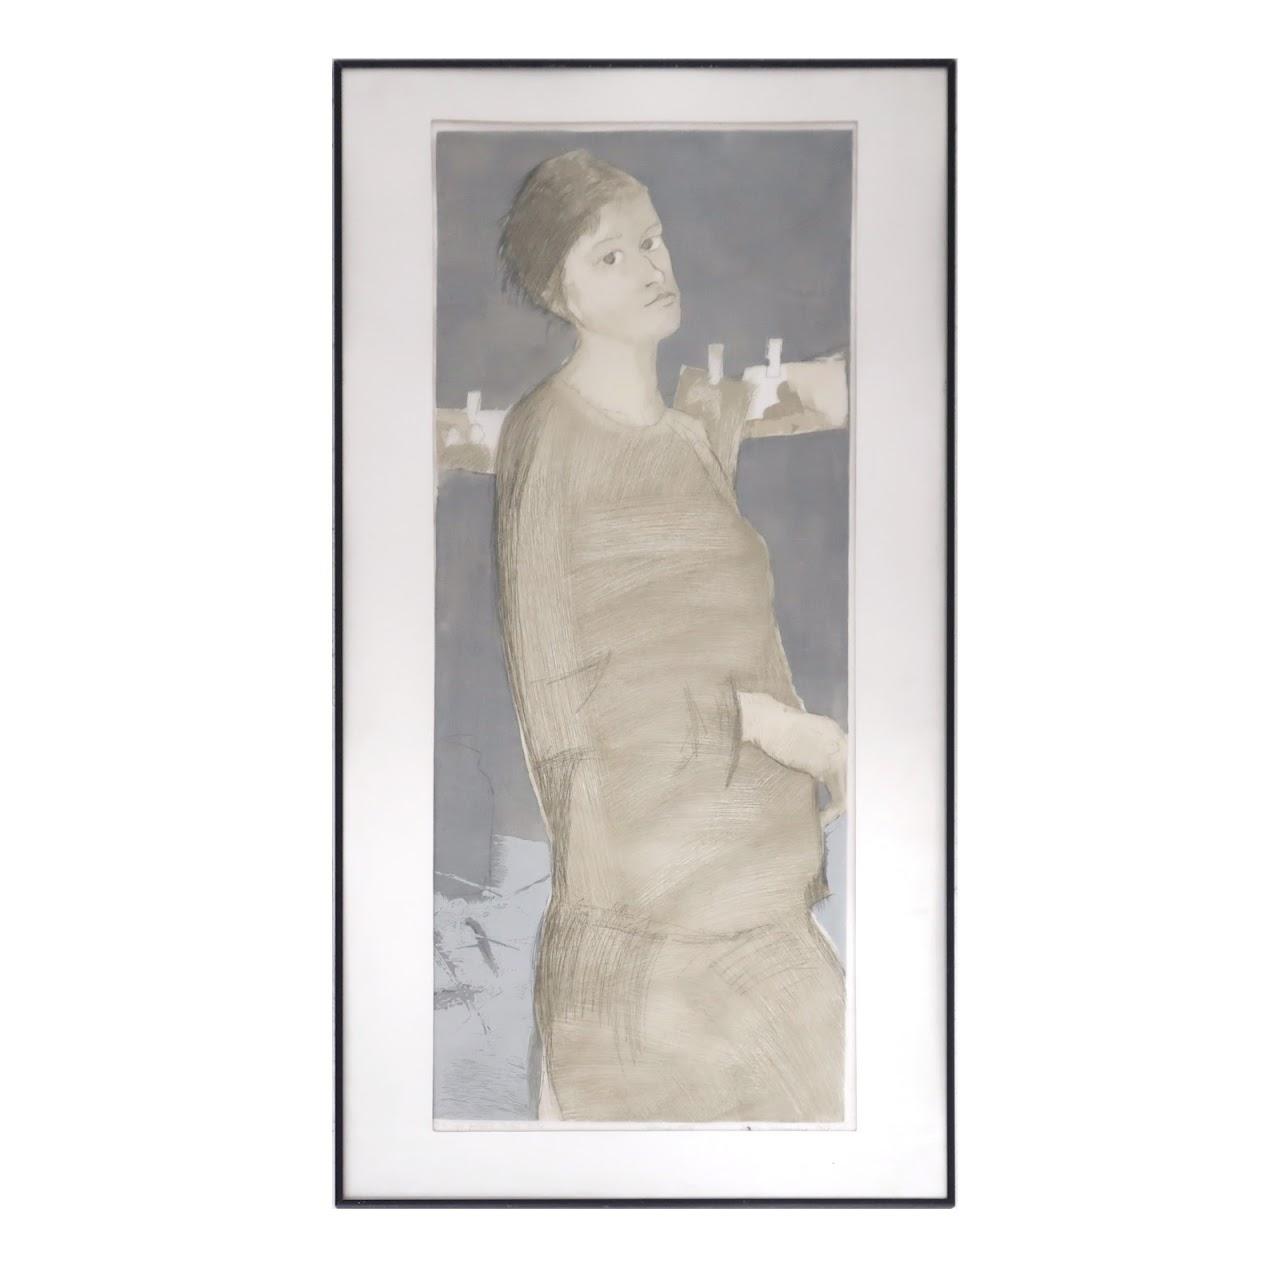 Signed Lithographic Portrait 2